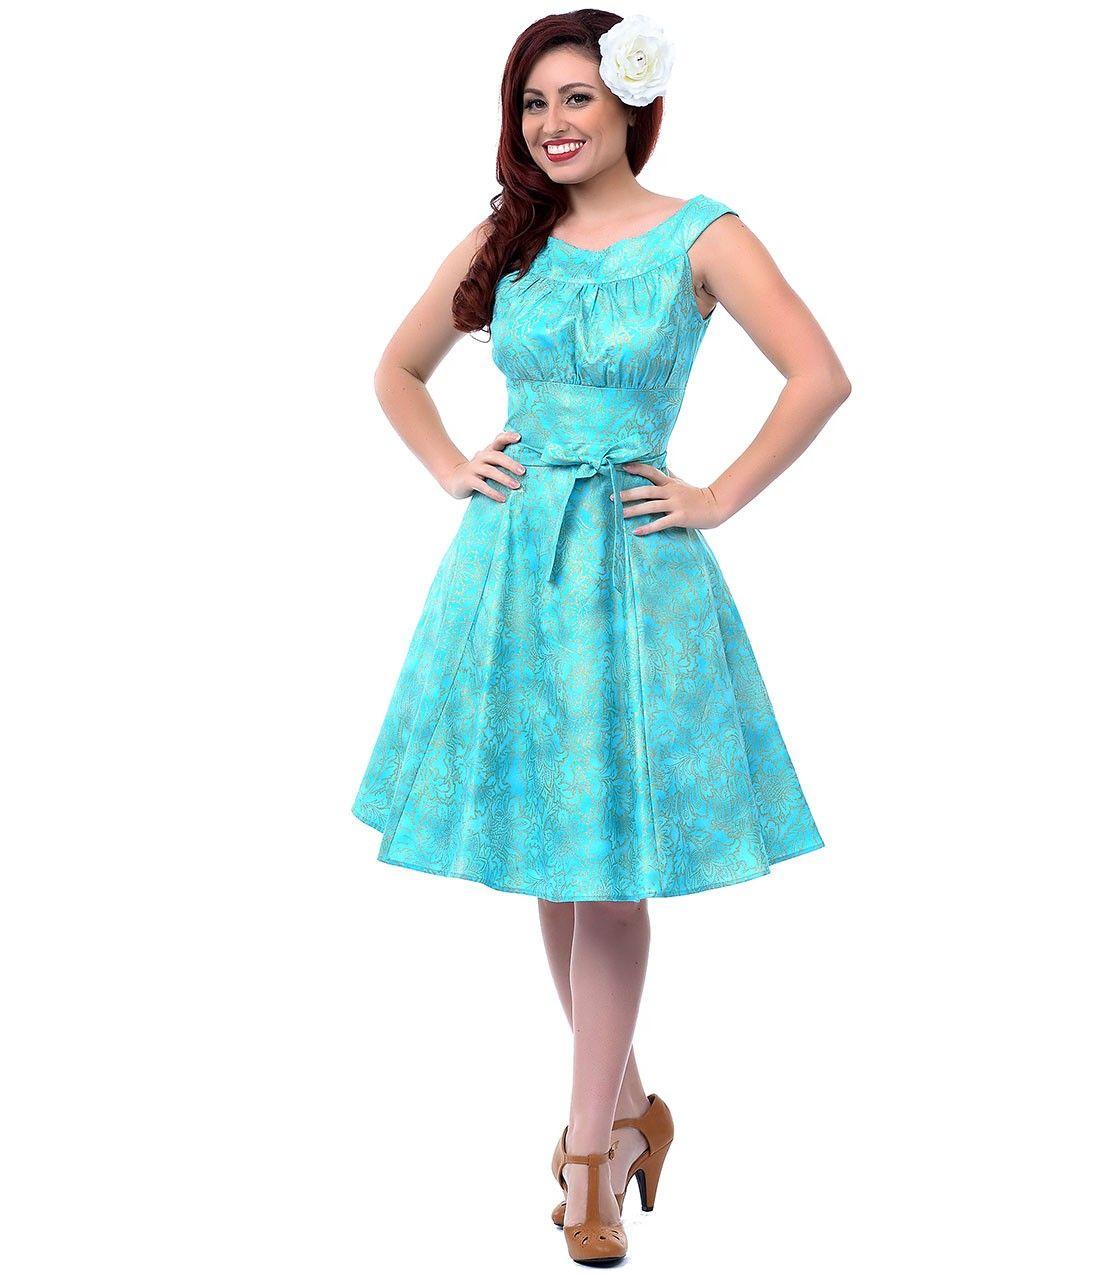 Aqua & Gold 1950s Style Amanda Swing Dress | Style | Pinterest ...